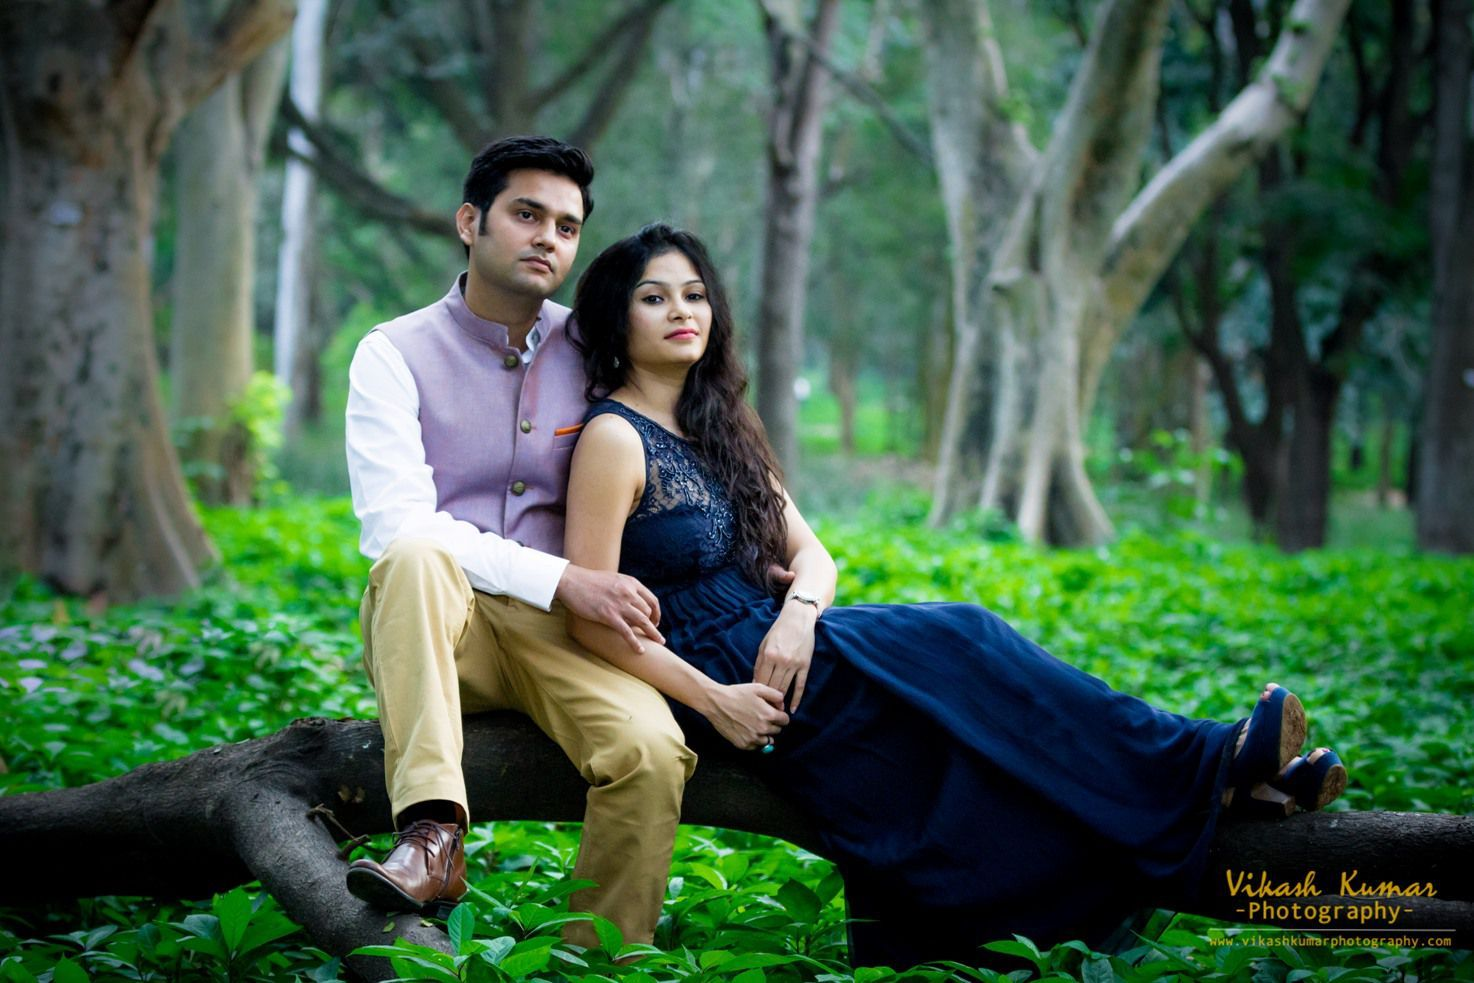 Indian Pre Wedding Photoshoot Ideas 2016